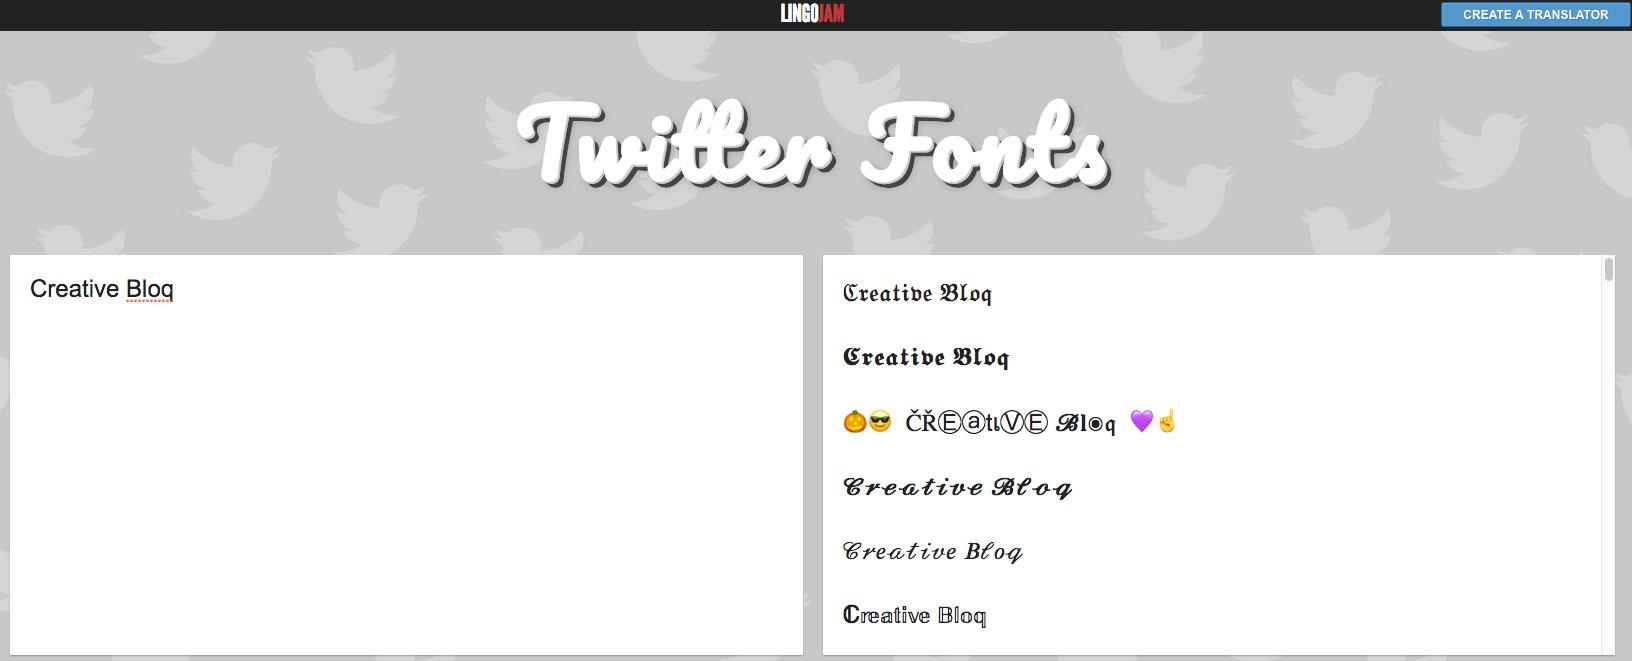 LingoJam Twitter fonts screenshot